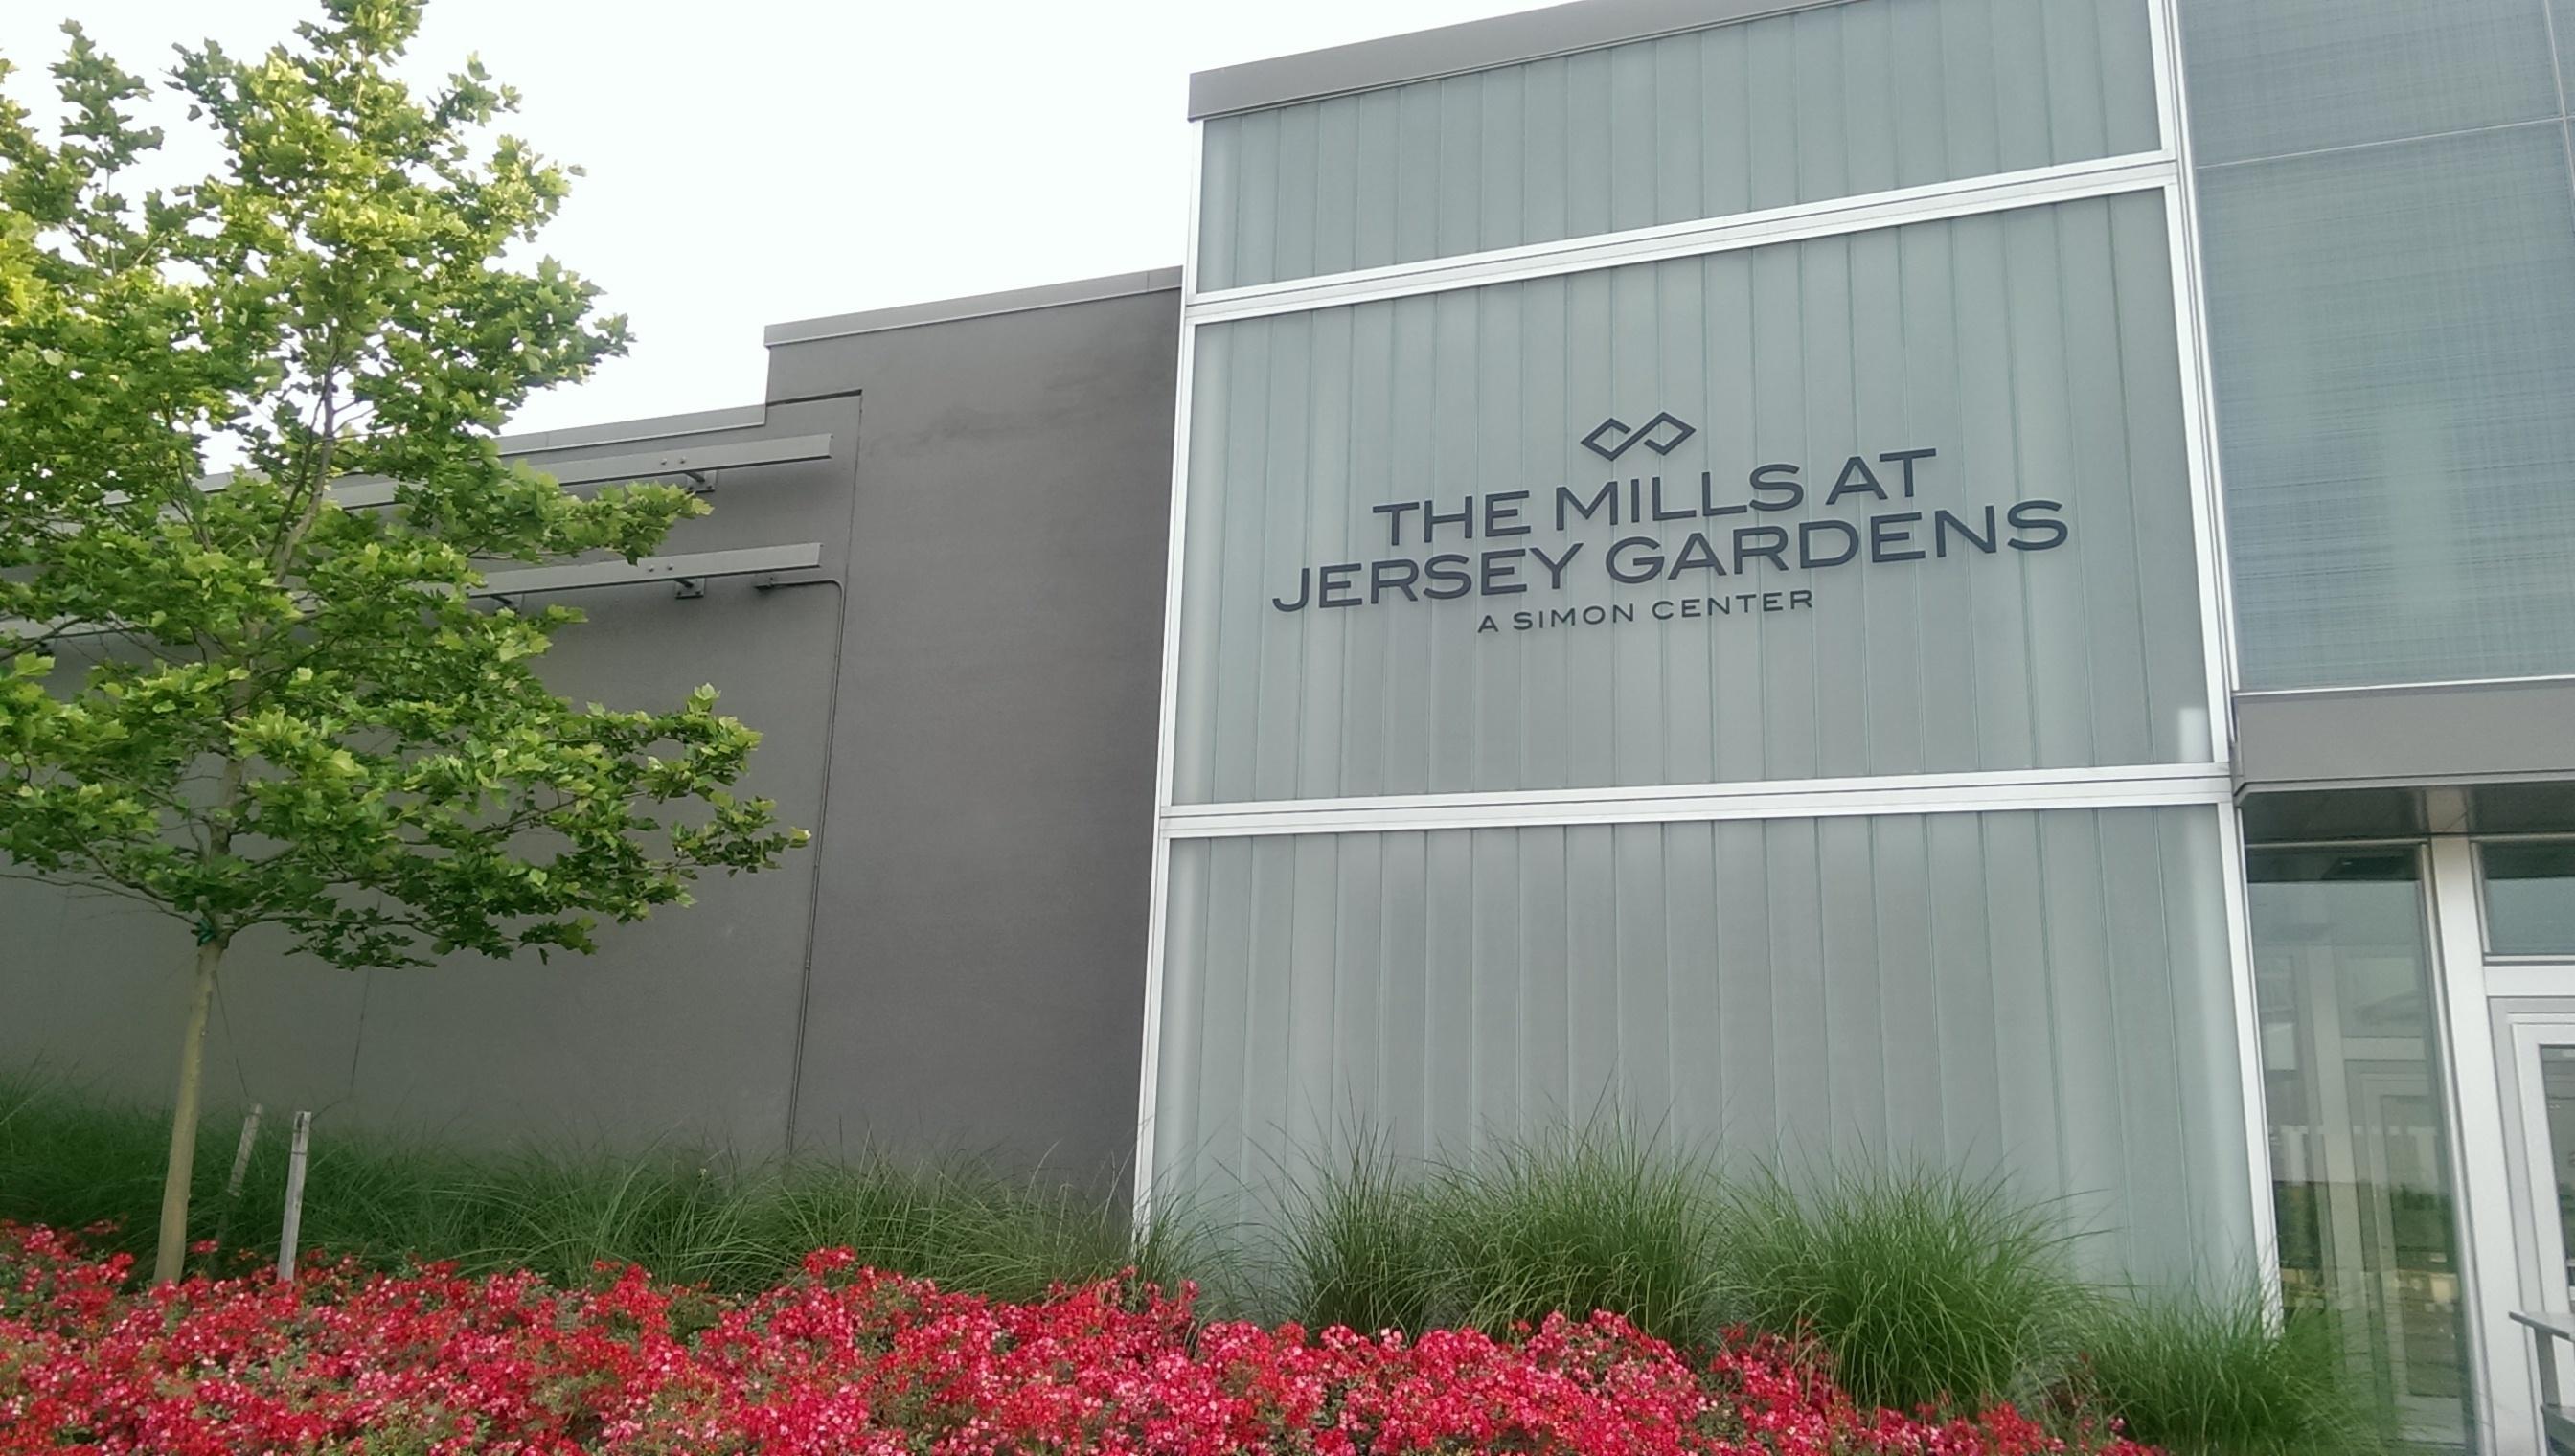 bd2c3f48976827fd305f_The_Mills_at_Jersey_Gardens_-_Exterior.jpg